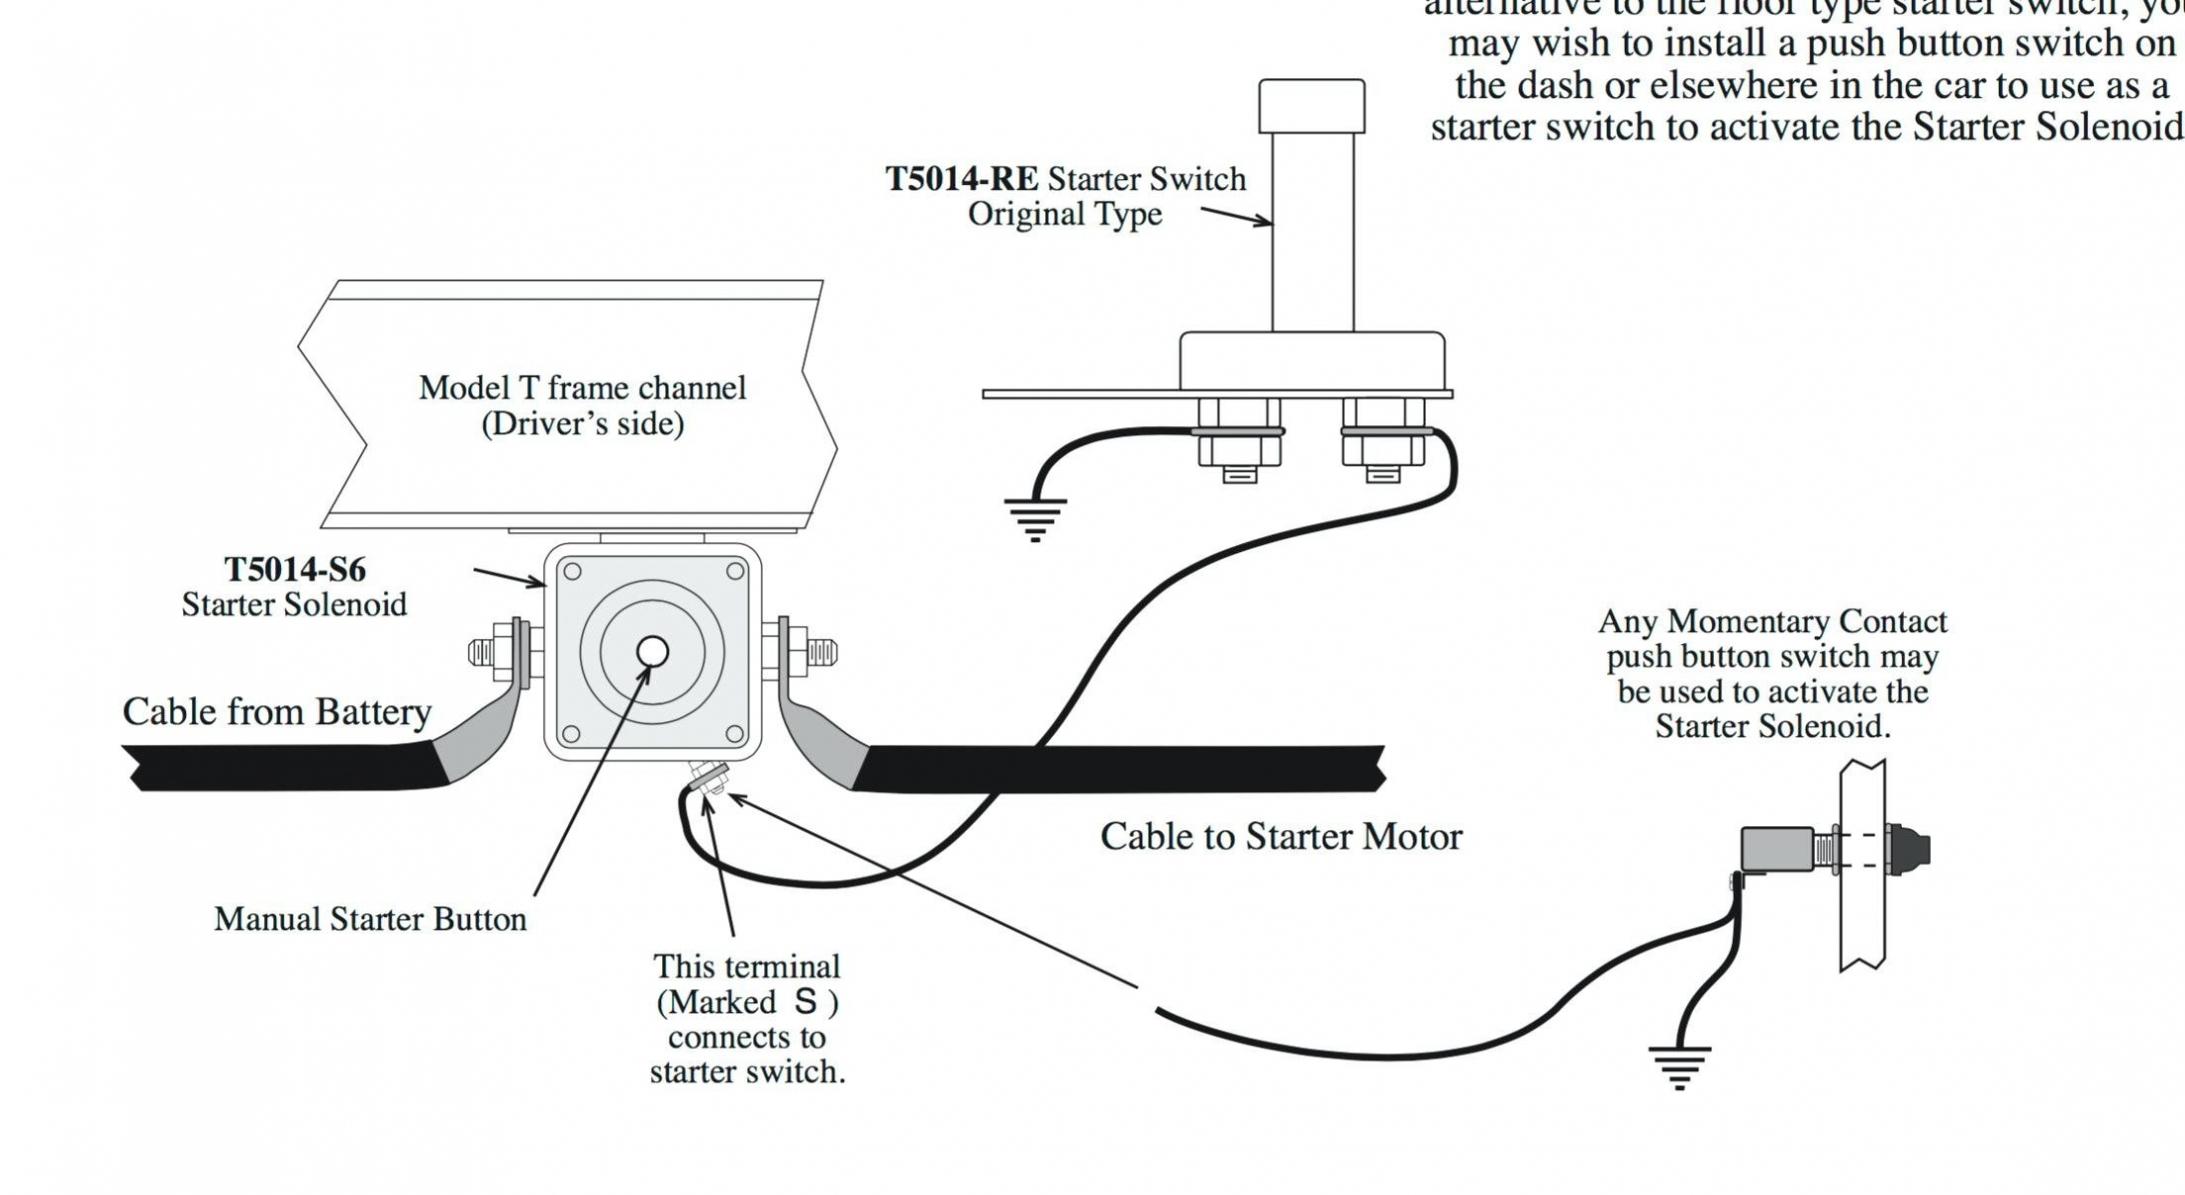 Lawn Mower Starter Solenoid Wiring Diagram | Wiring Diagram - Riding Lawn Mower Starter Solenoid Wiring Diagram